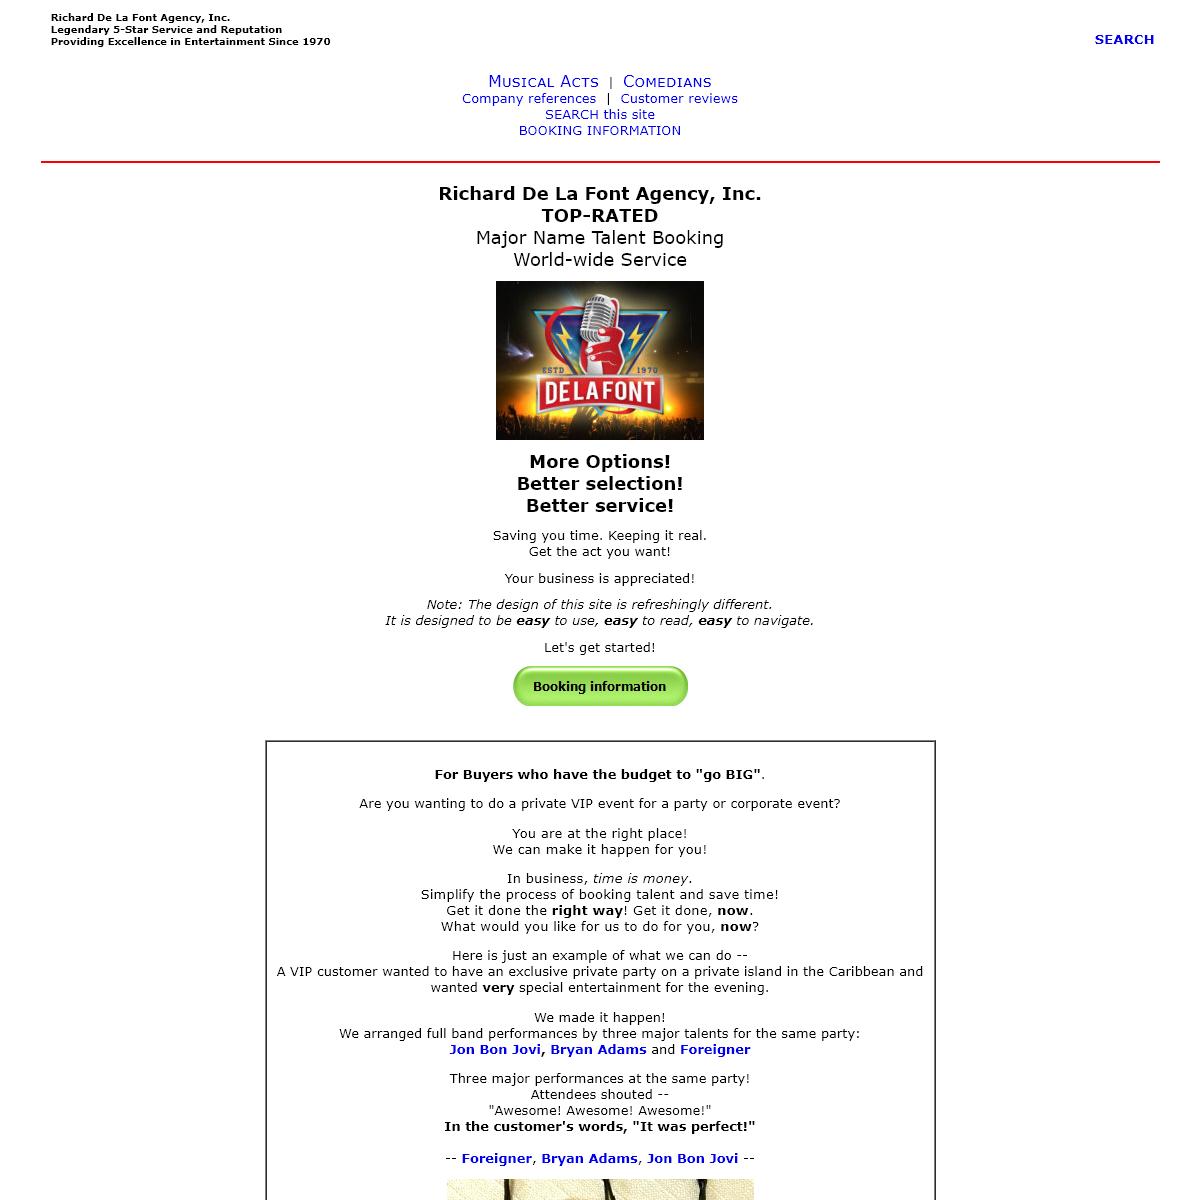 RICHARD DE LA FONT AGENCY - Top-Rated Corporate Event Booking Agent